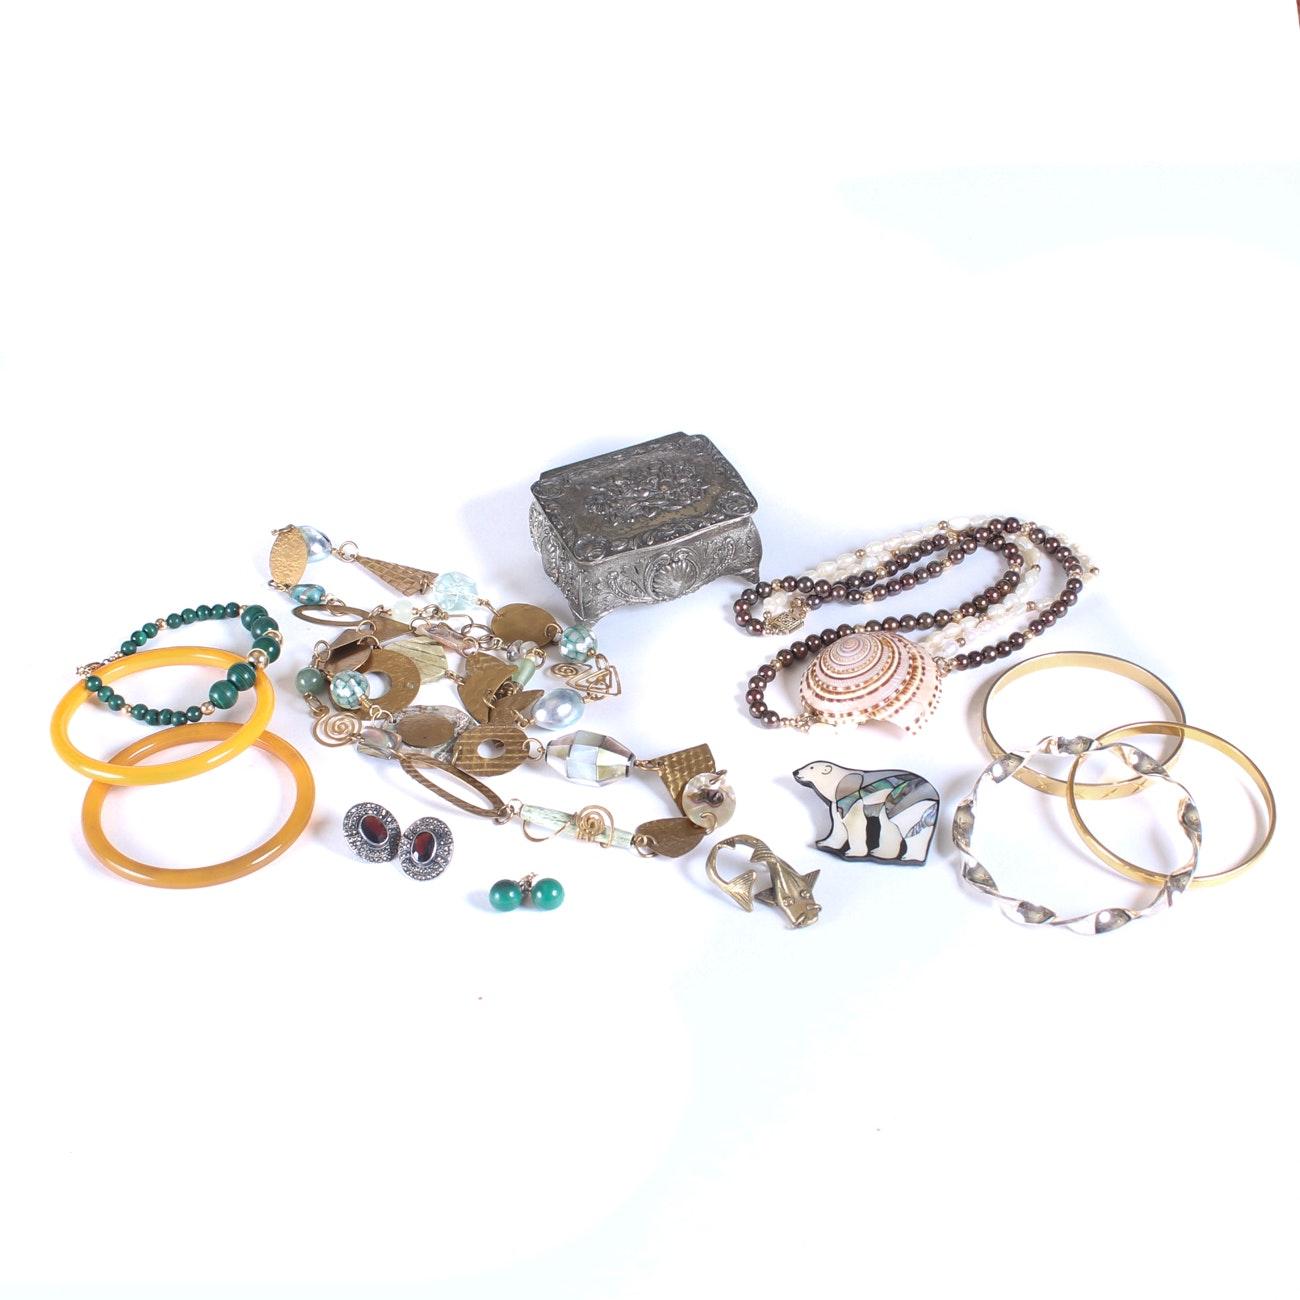 Assortment of Costume Jewelry with Trinket Box